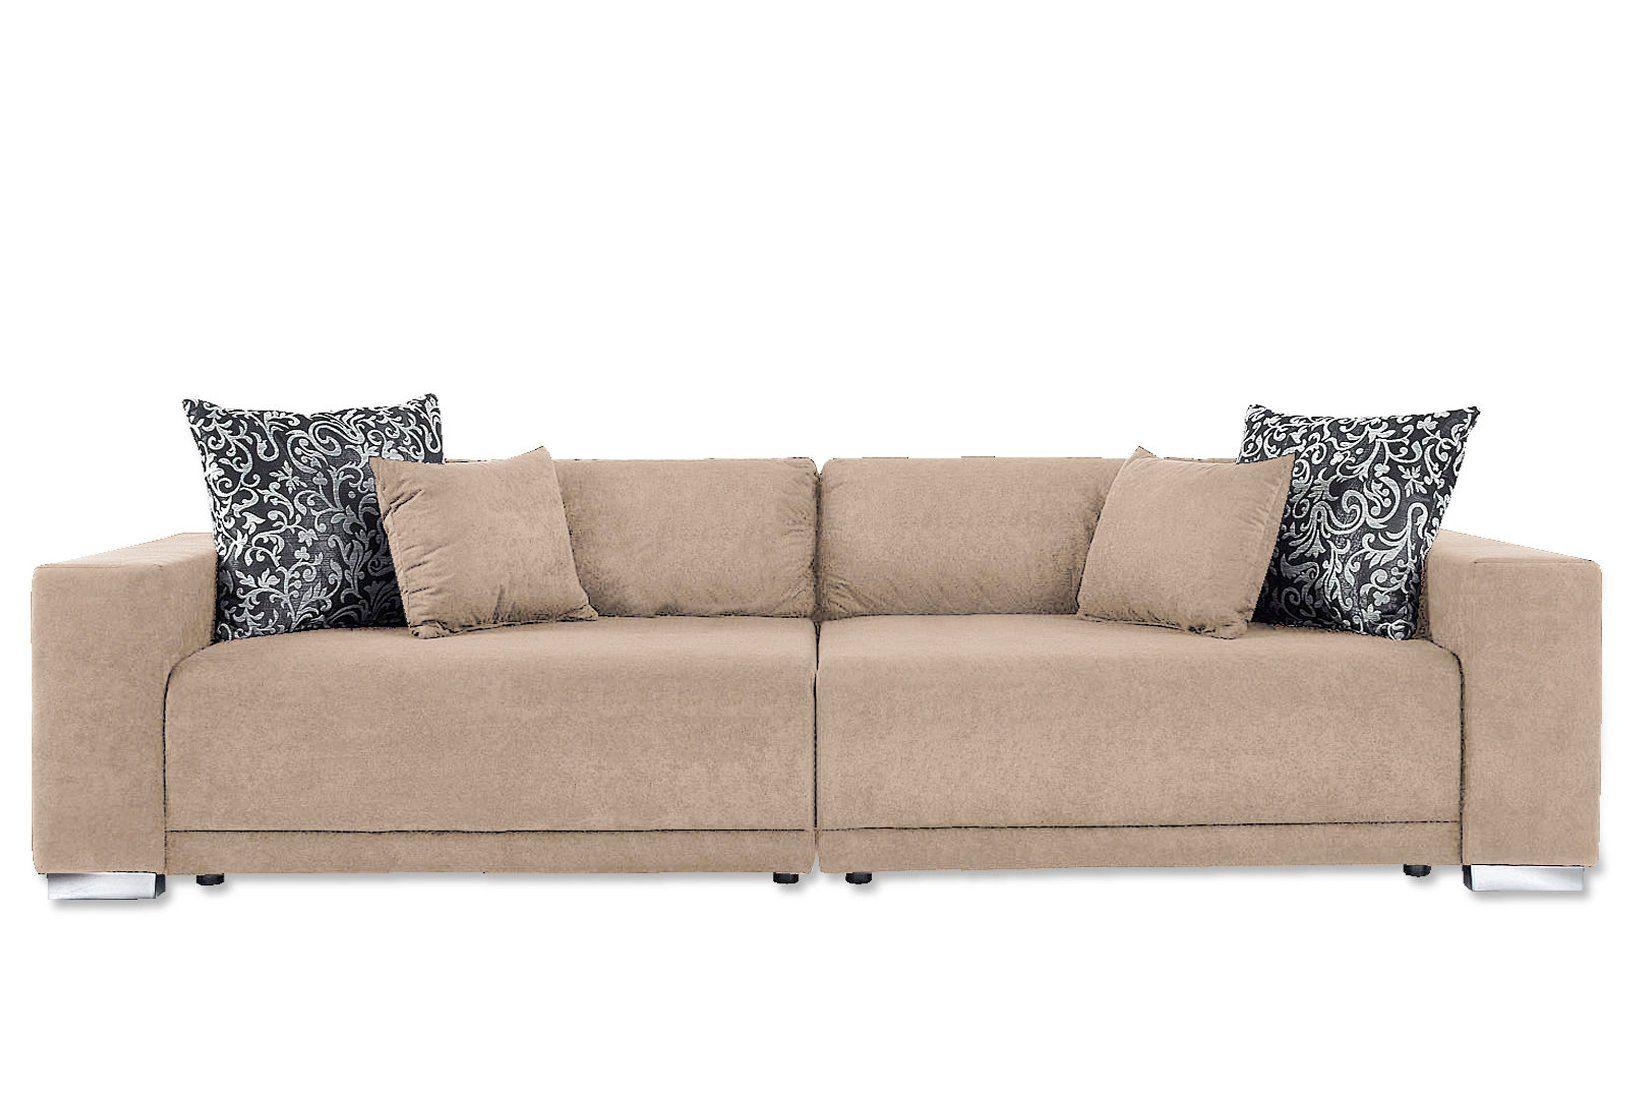 big sofa schwab versand polsterhocker. Black Bedroom Furniture Sets. Home Design Ideas